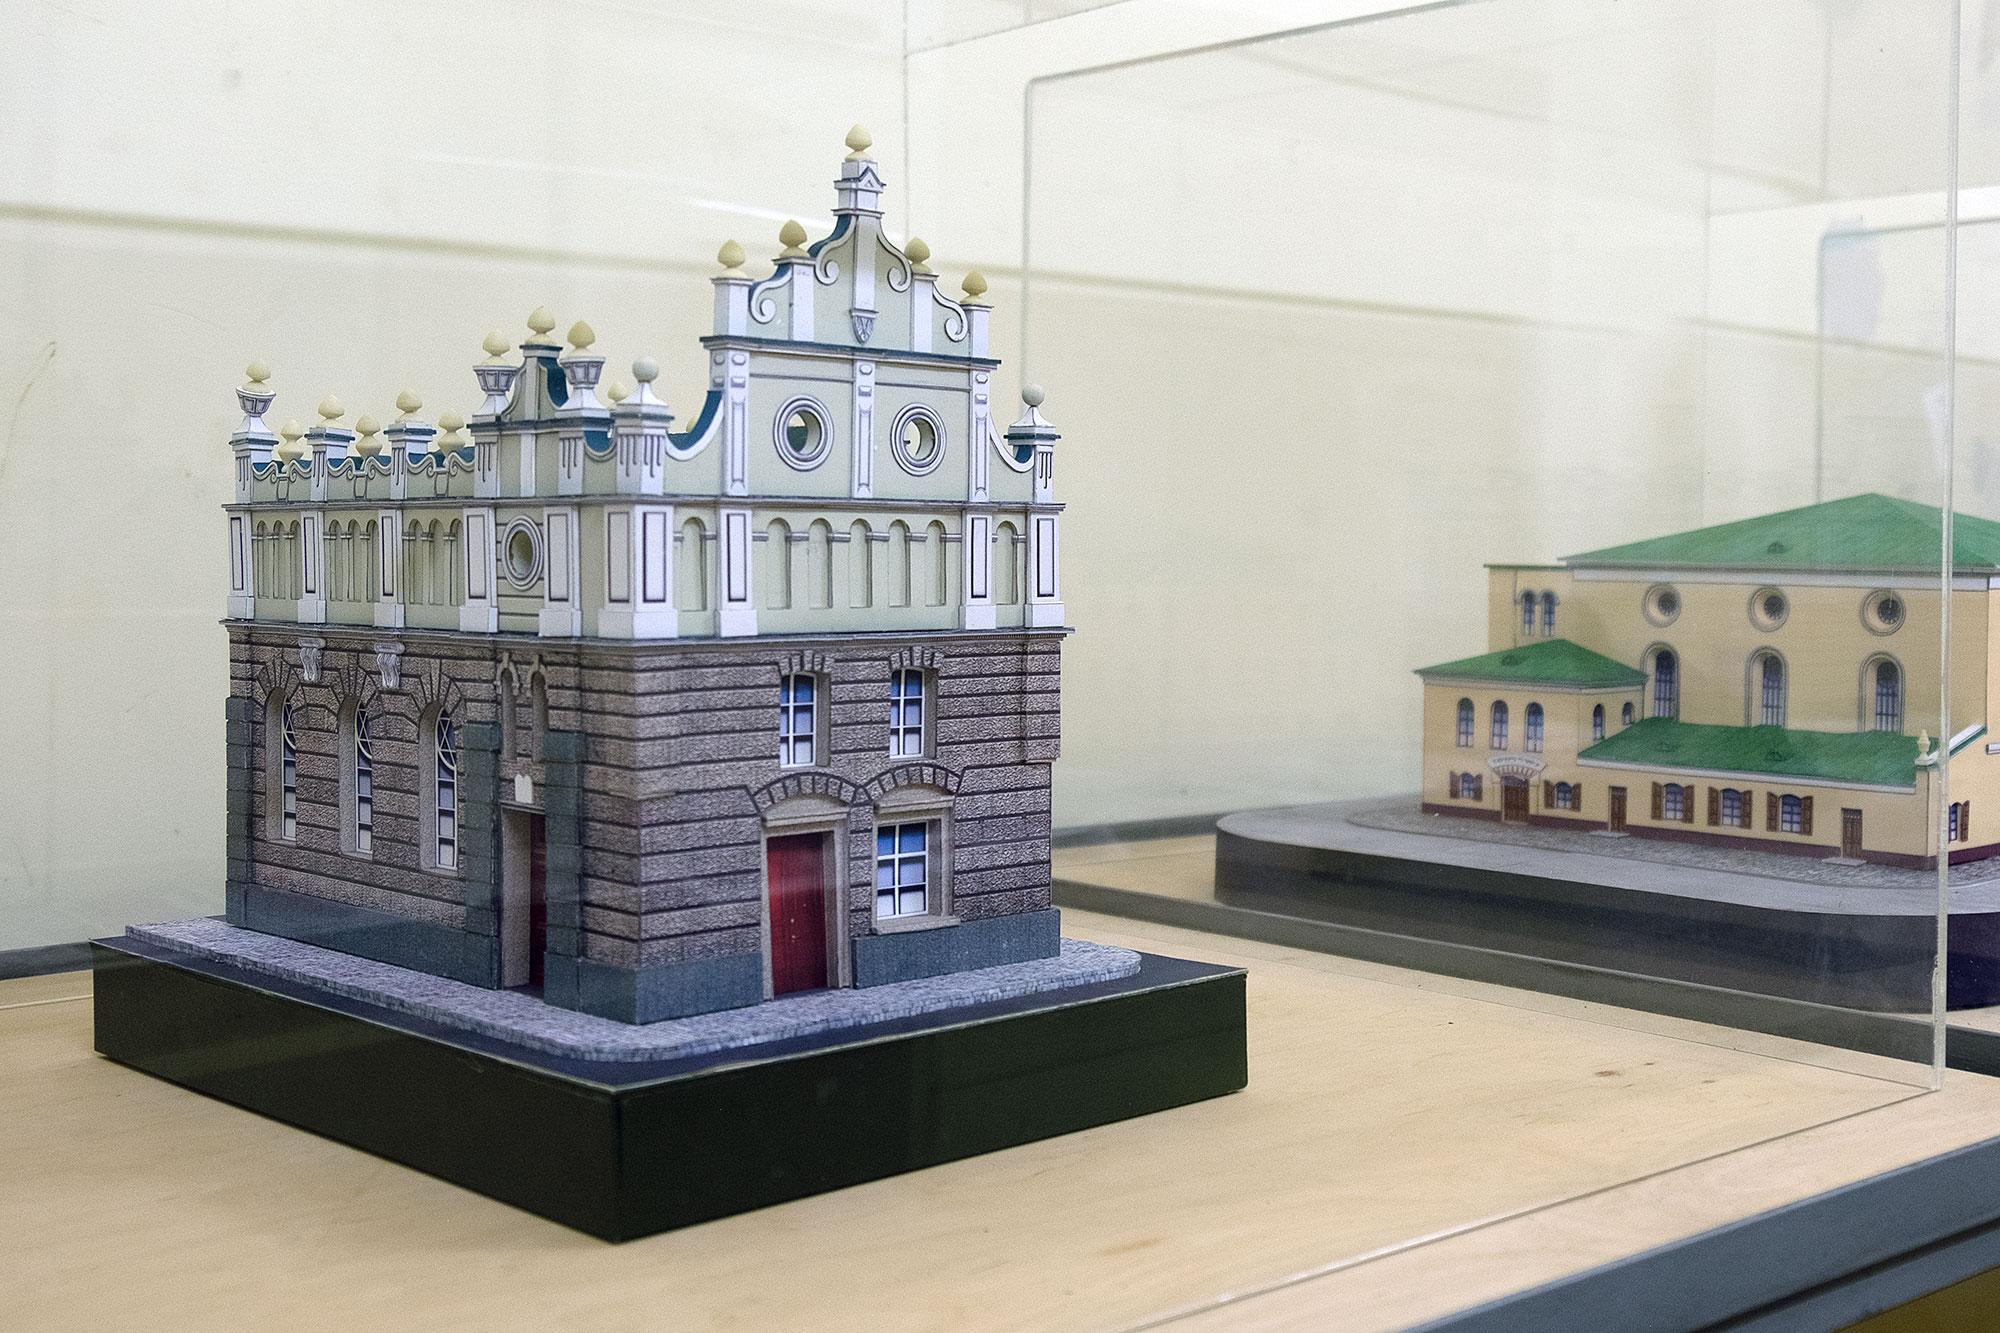 Lviv - Synagogue model in the Jakub Glanzer Shul